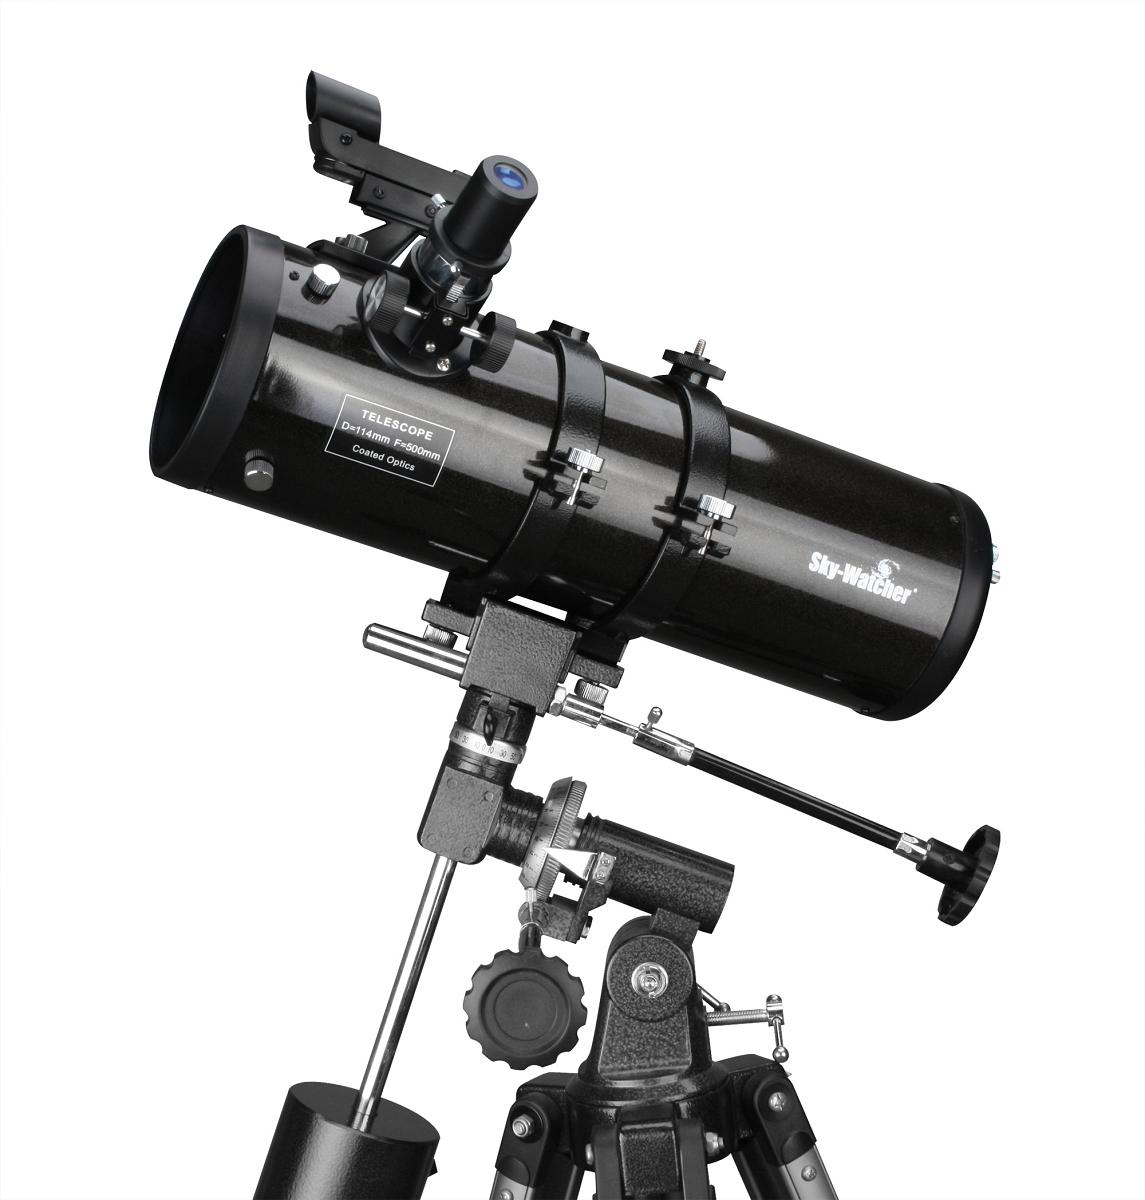 Professional Dslr Cameras Beginners